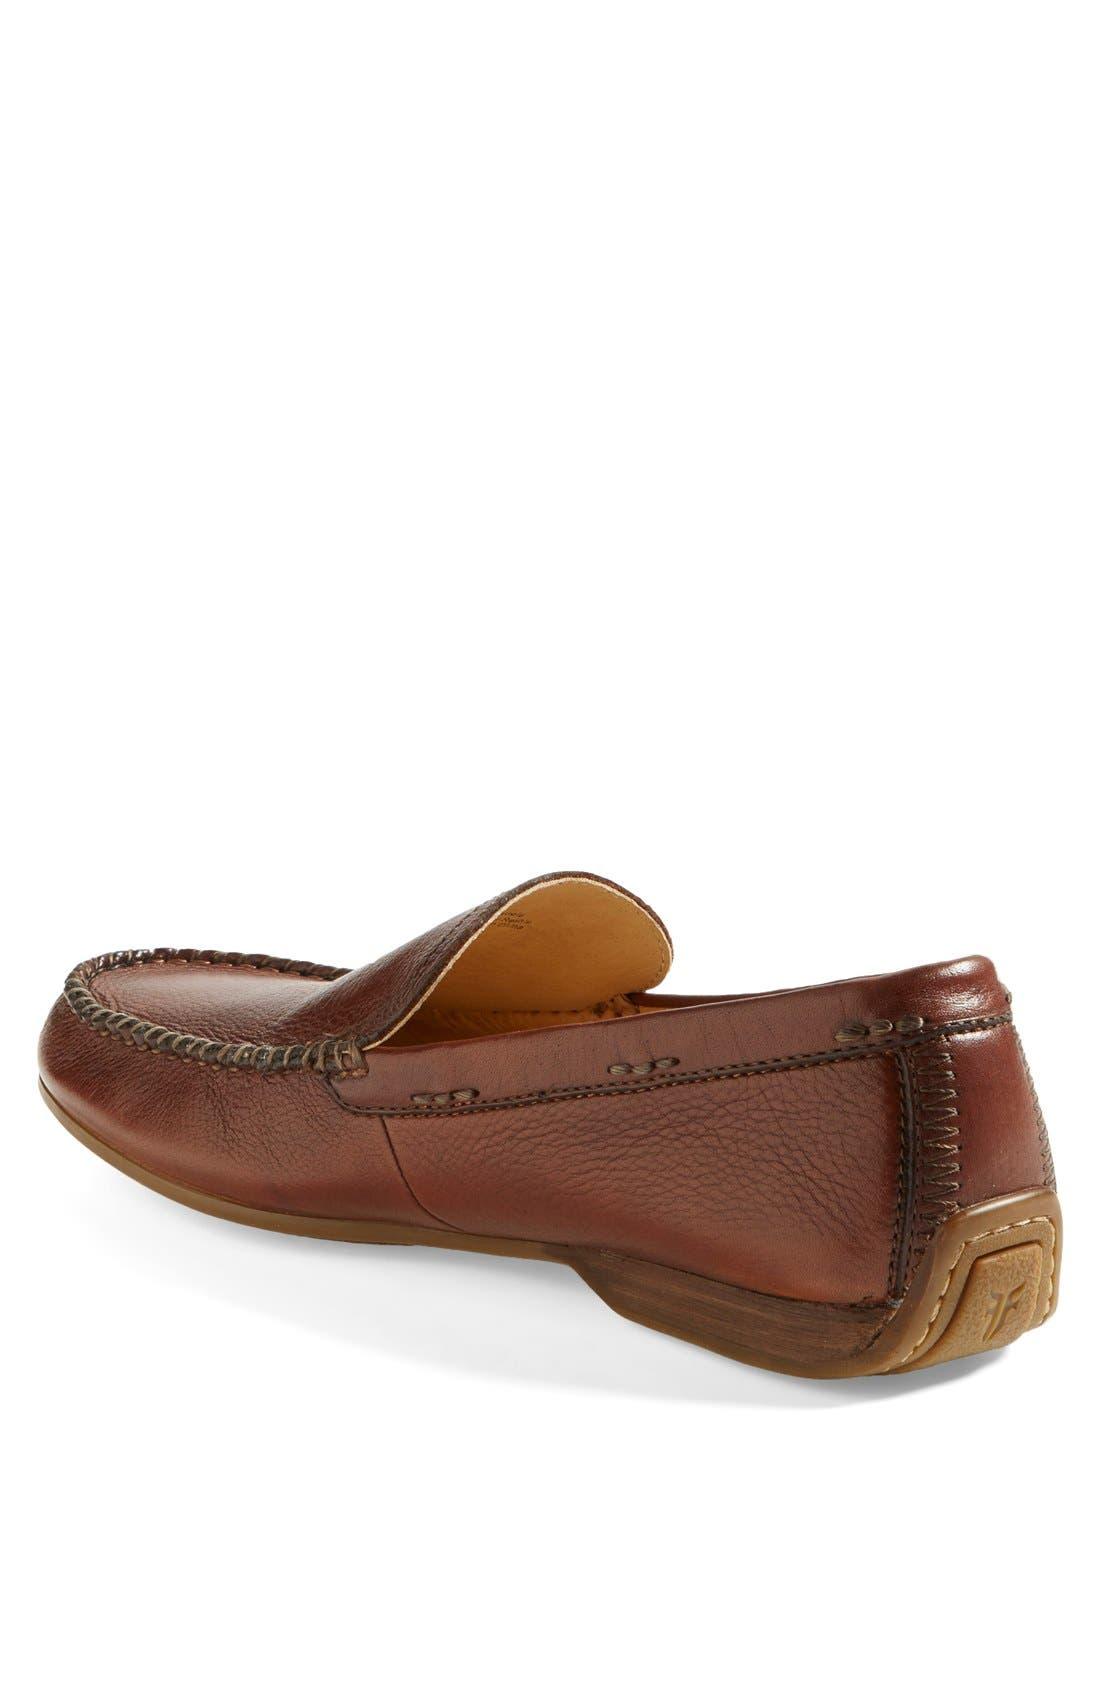 Alternate Image 2  - Frye 'Lewis' Venetian Loafer (Men)